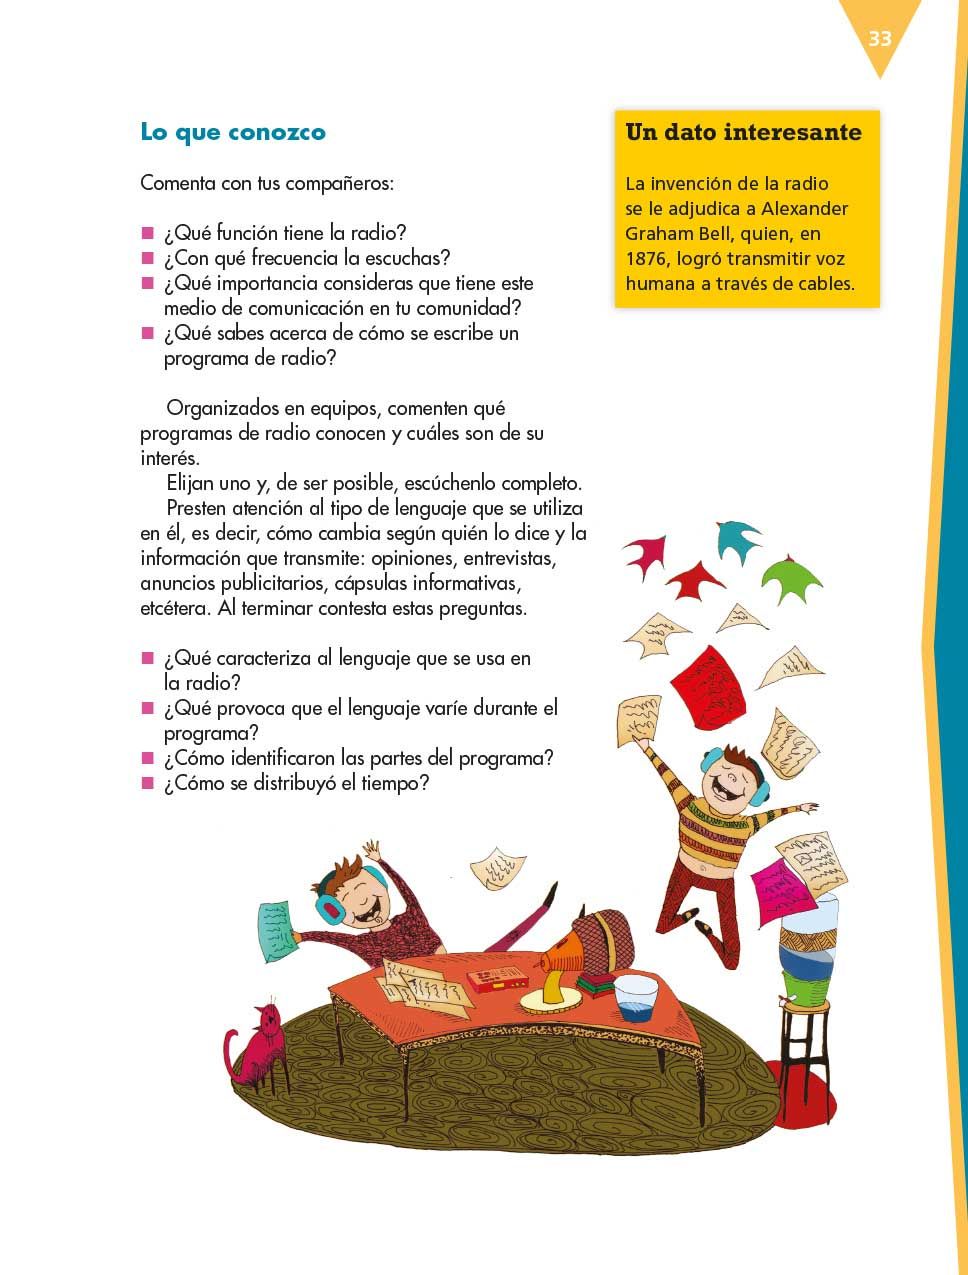 https://libros.conaliteg.gob.mx/c/P6ESA/033.jpg